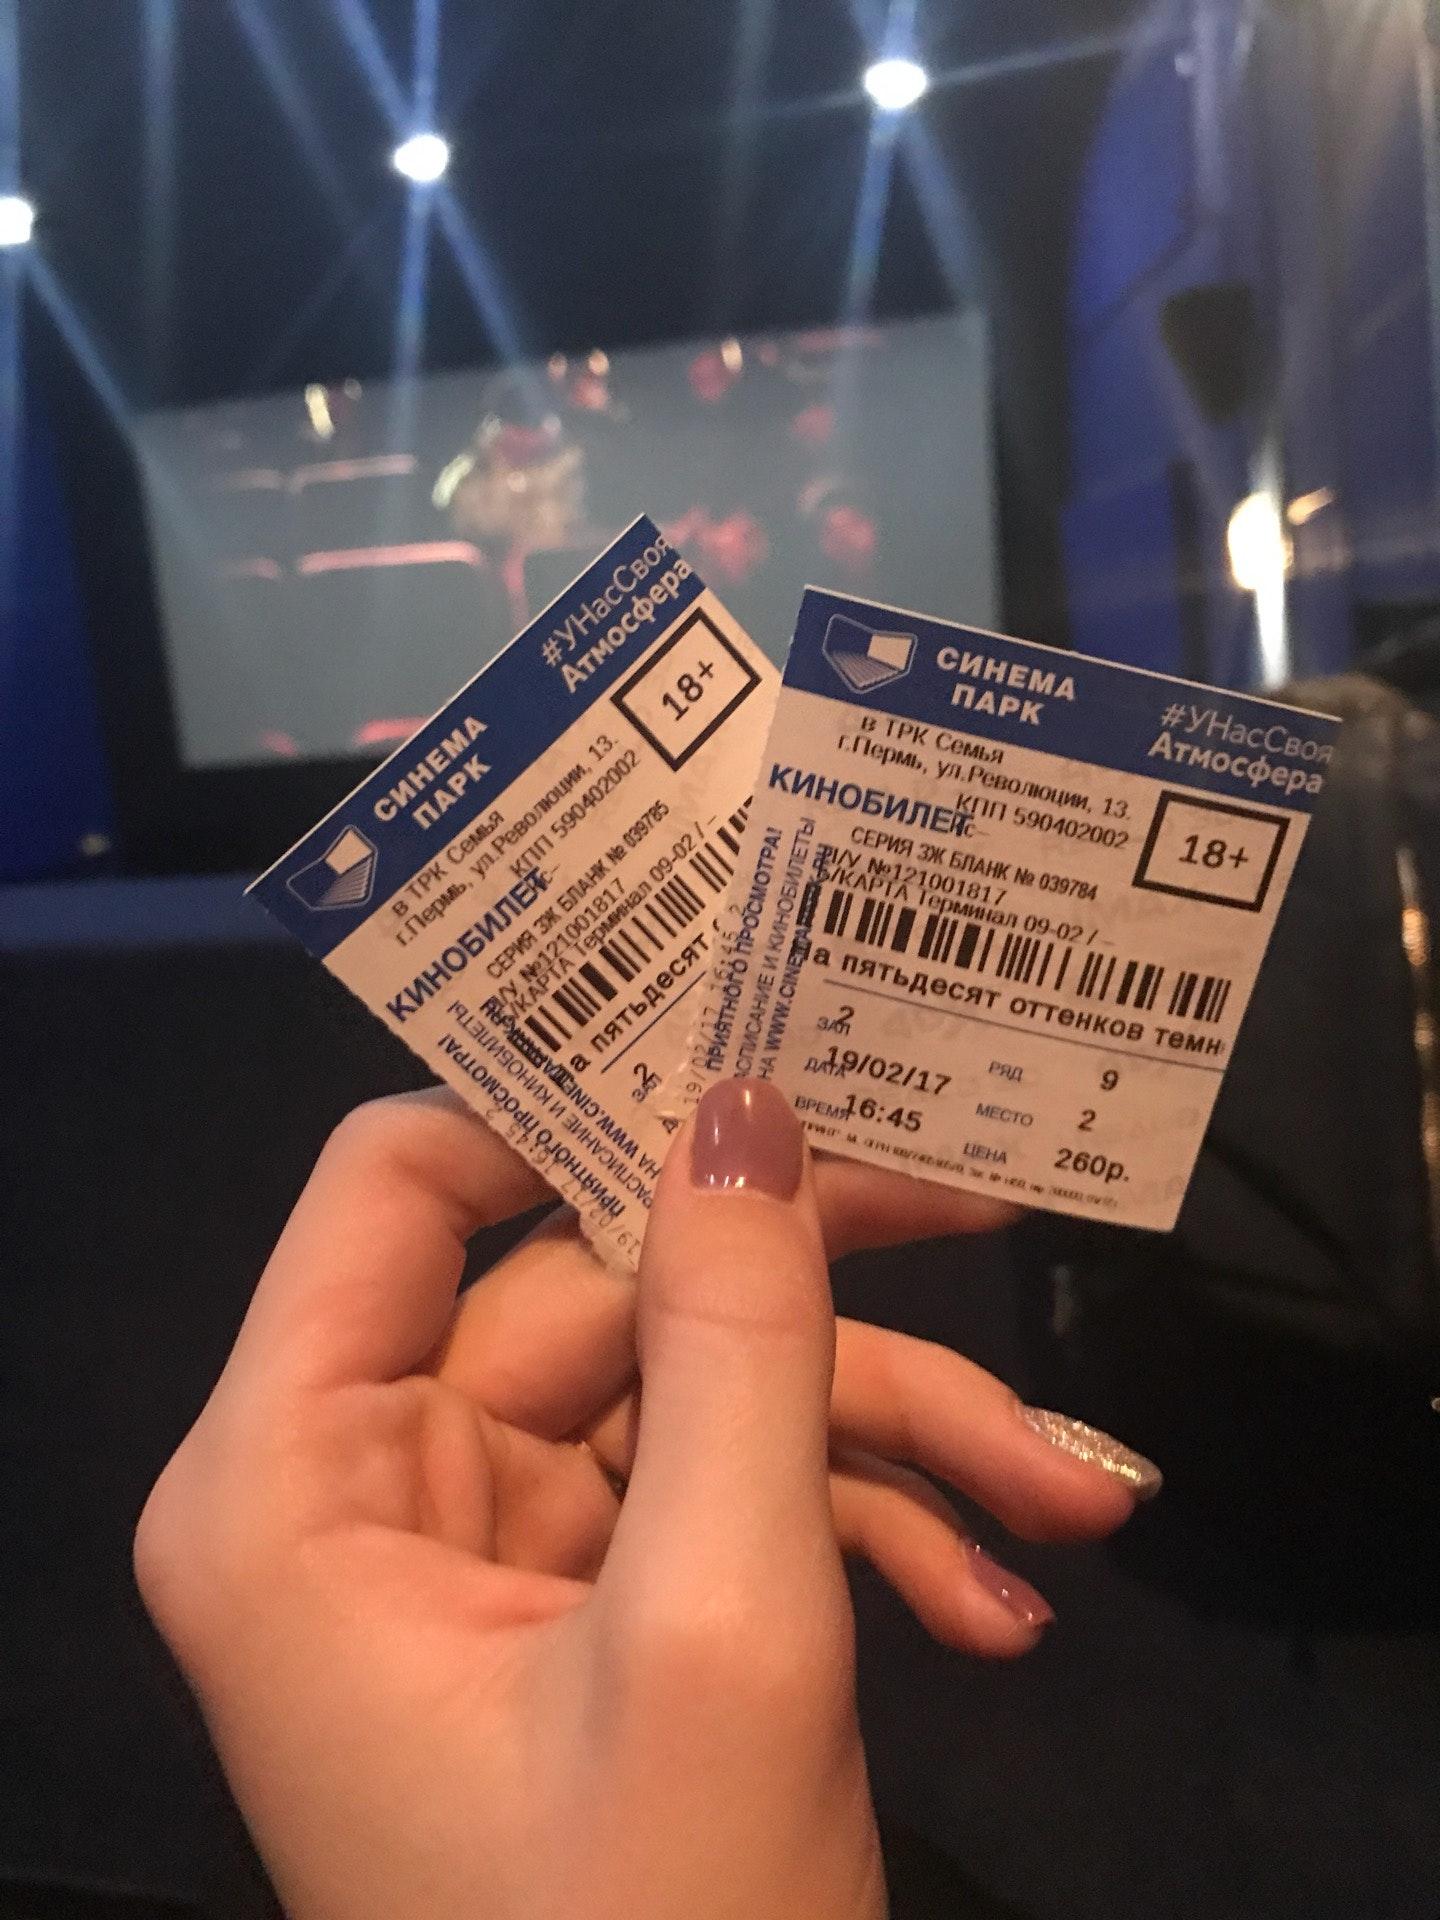 Картинки билетов в руке